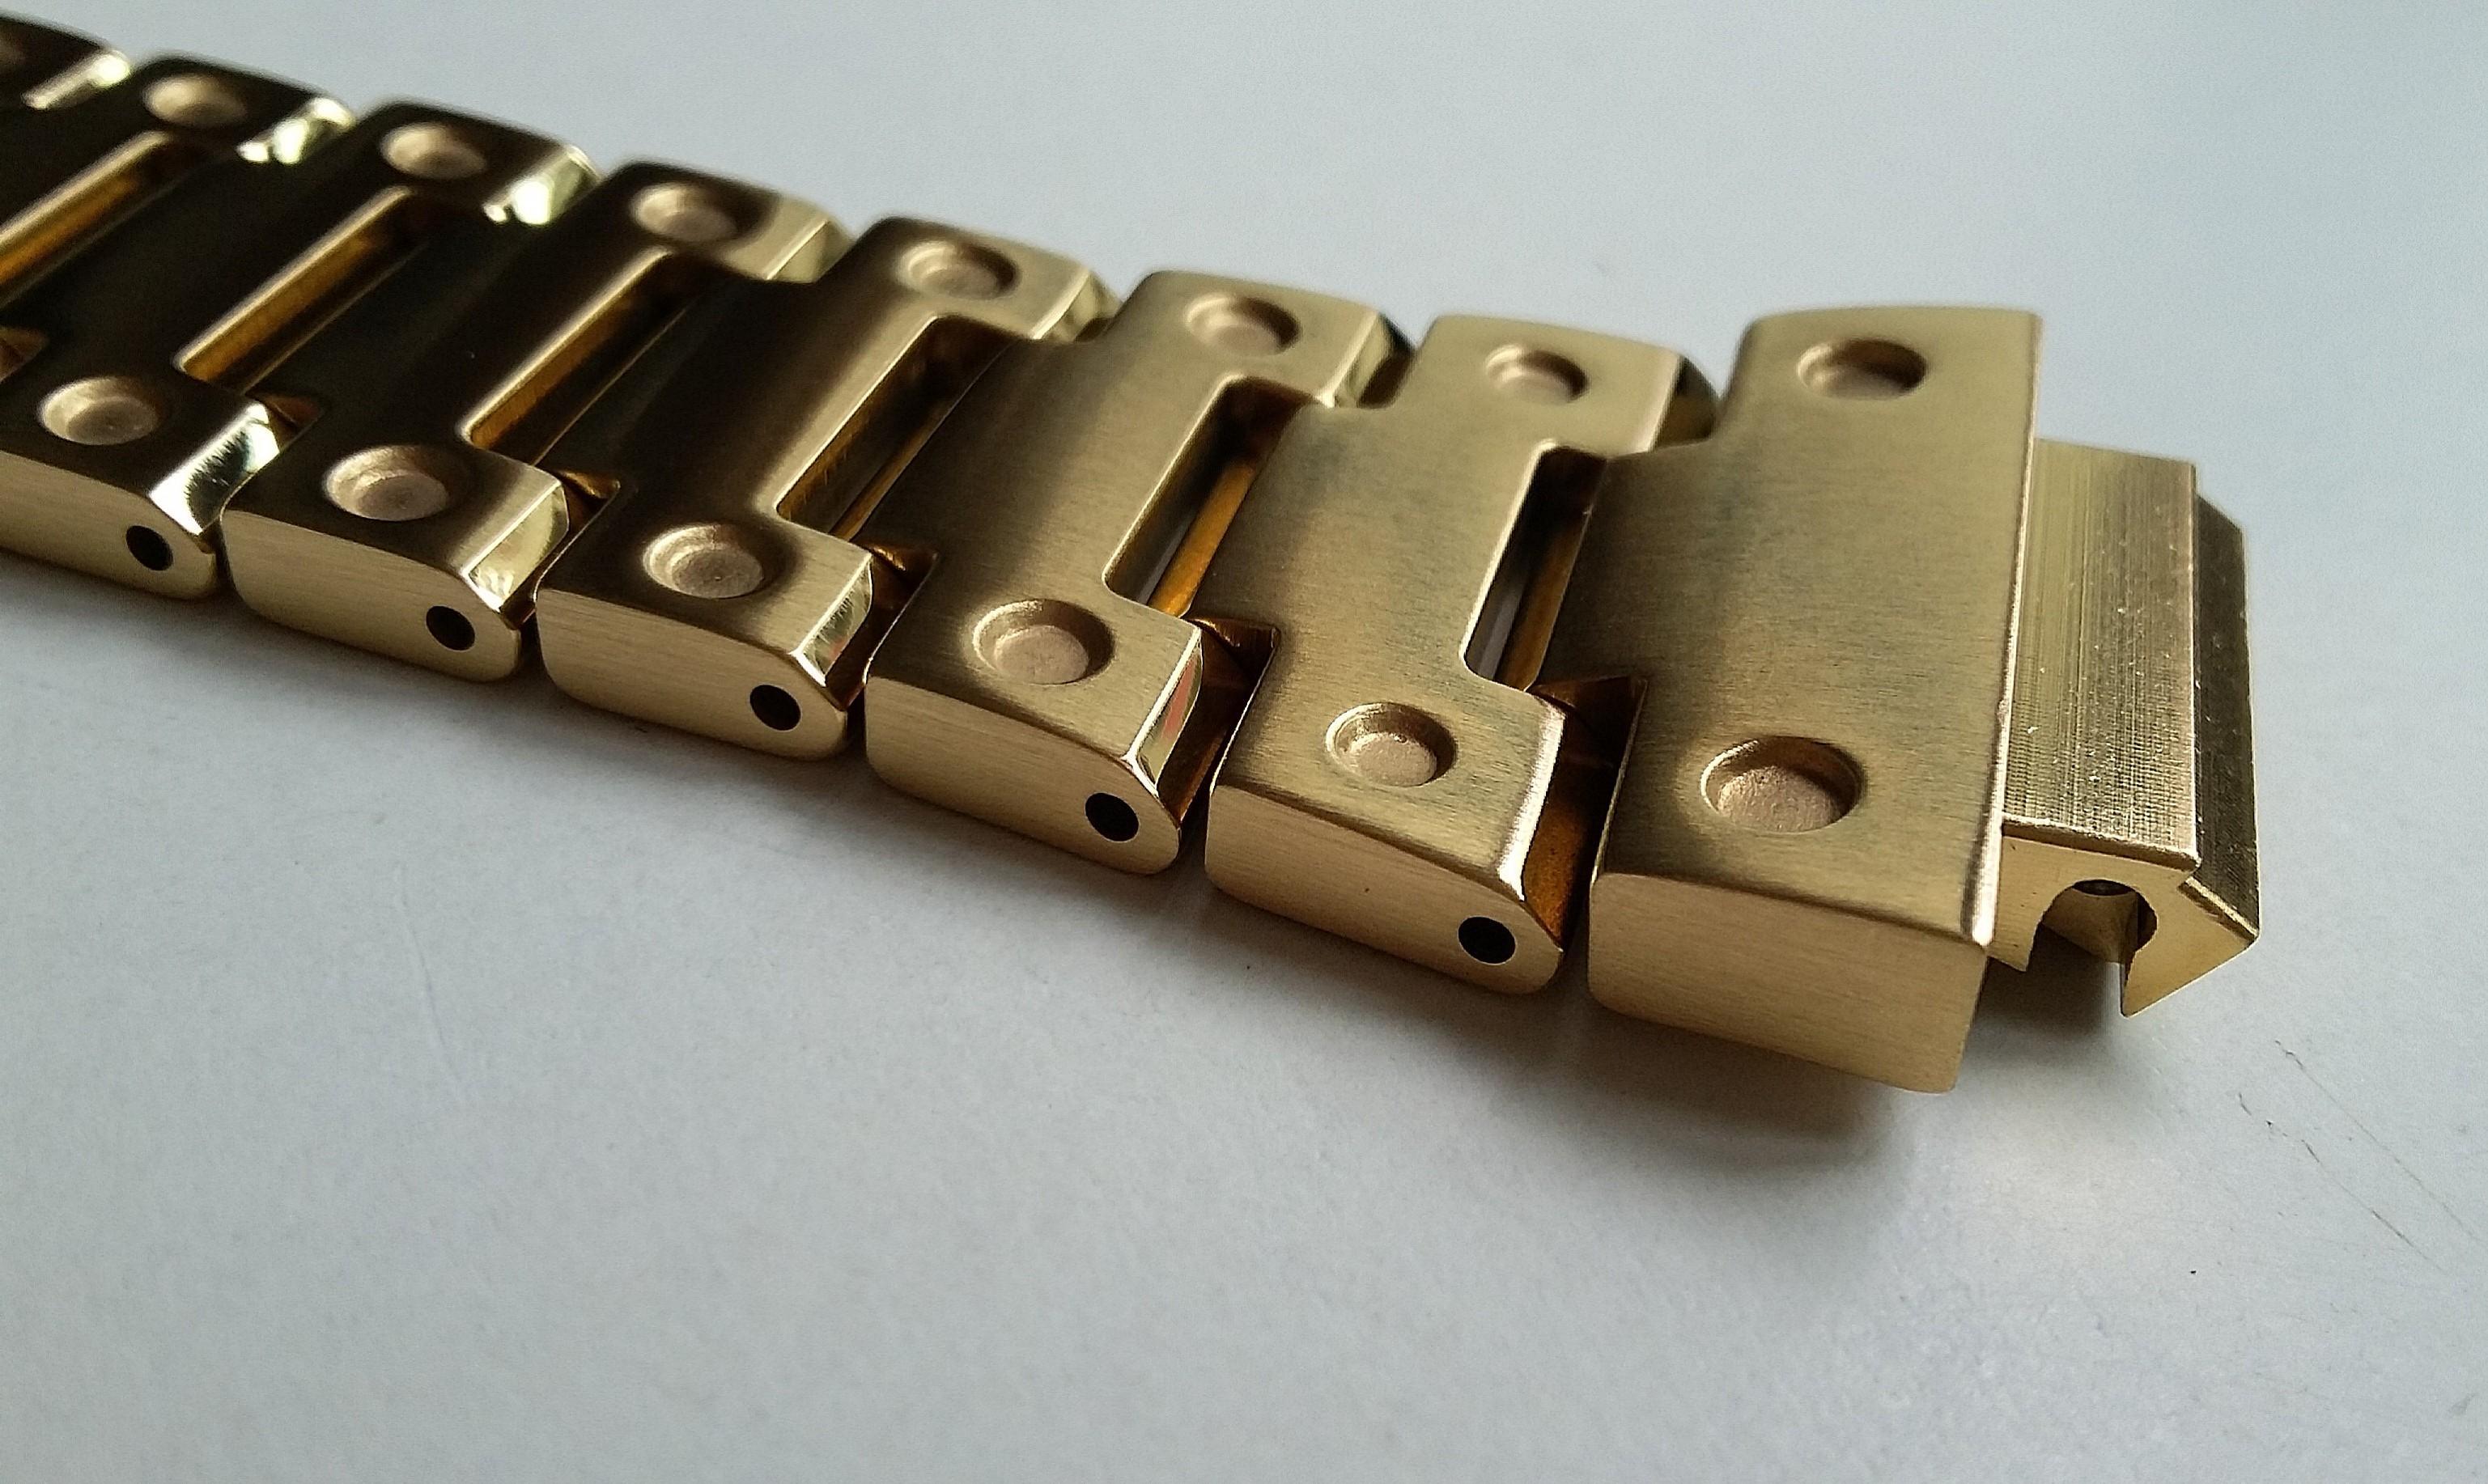 GOLD PLATED 316L STAINLESS STEEL BEZEL CASE AND BRACELET FOR CASIO G-SHOCK DW5610, G 5600E, GW-M5610, GW-M5600, GLX-5600, GLS-5600, GW-M5630, GW-S5600, DW-D5600(PRICE INCLUDE M0DIFICATION)